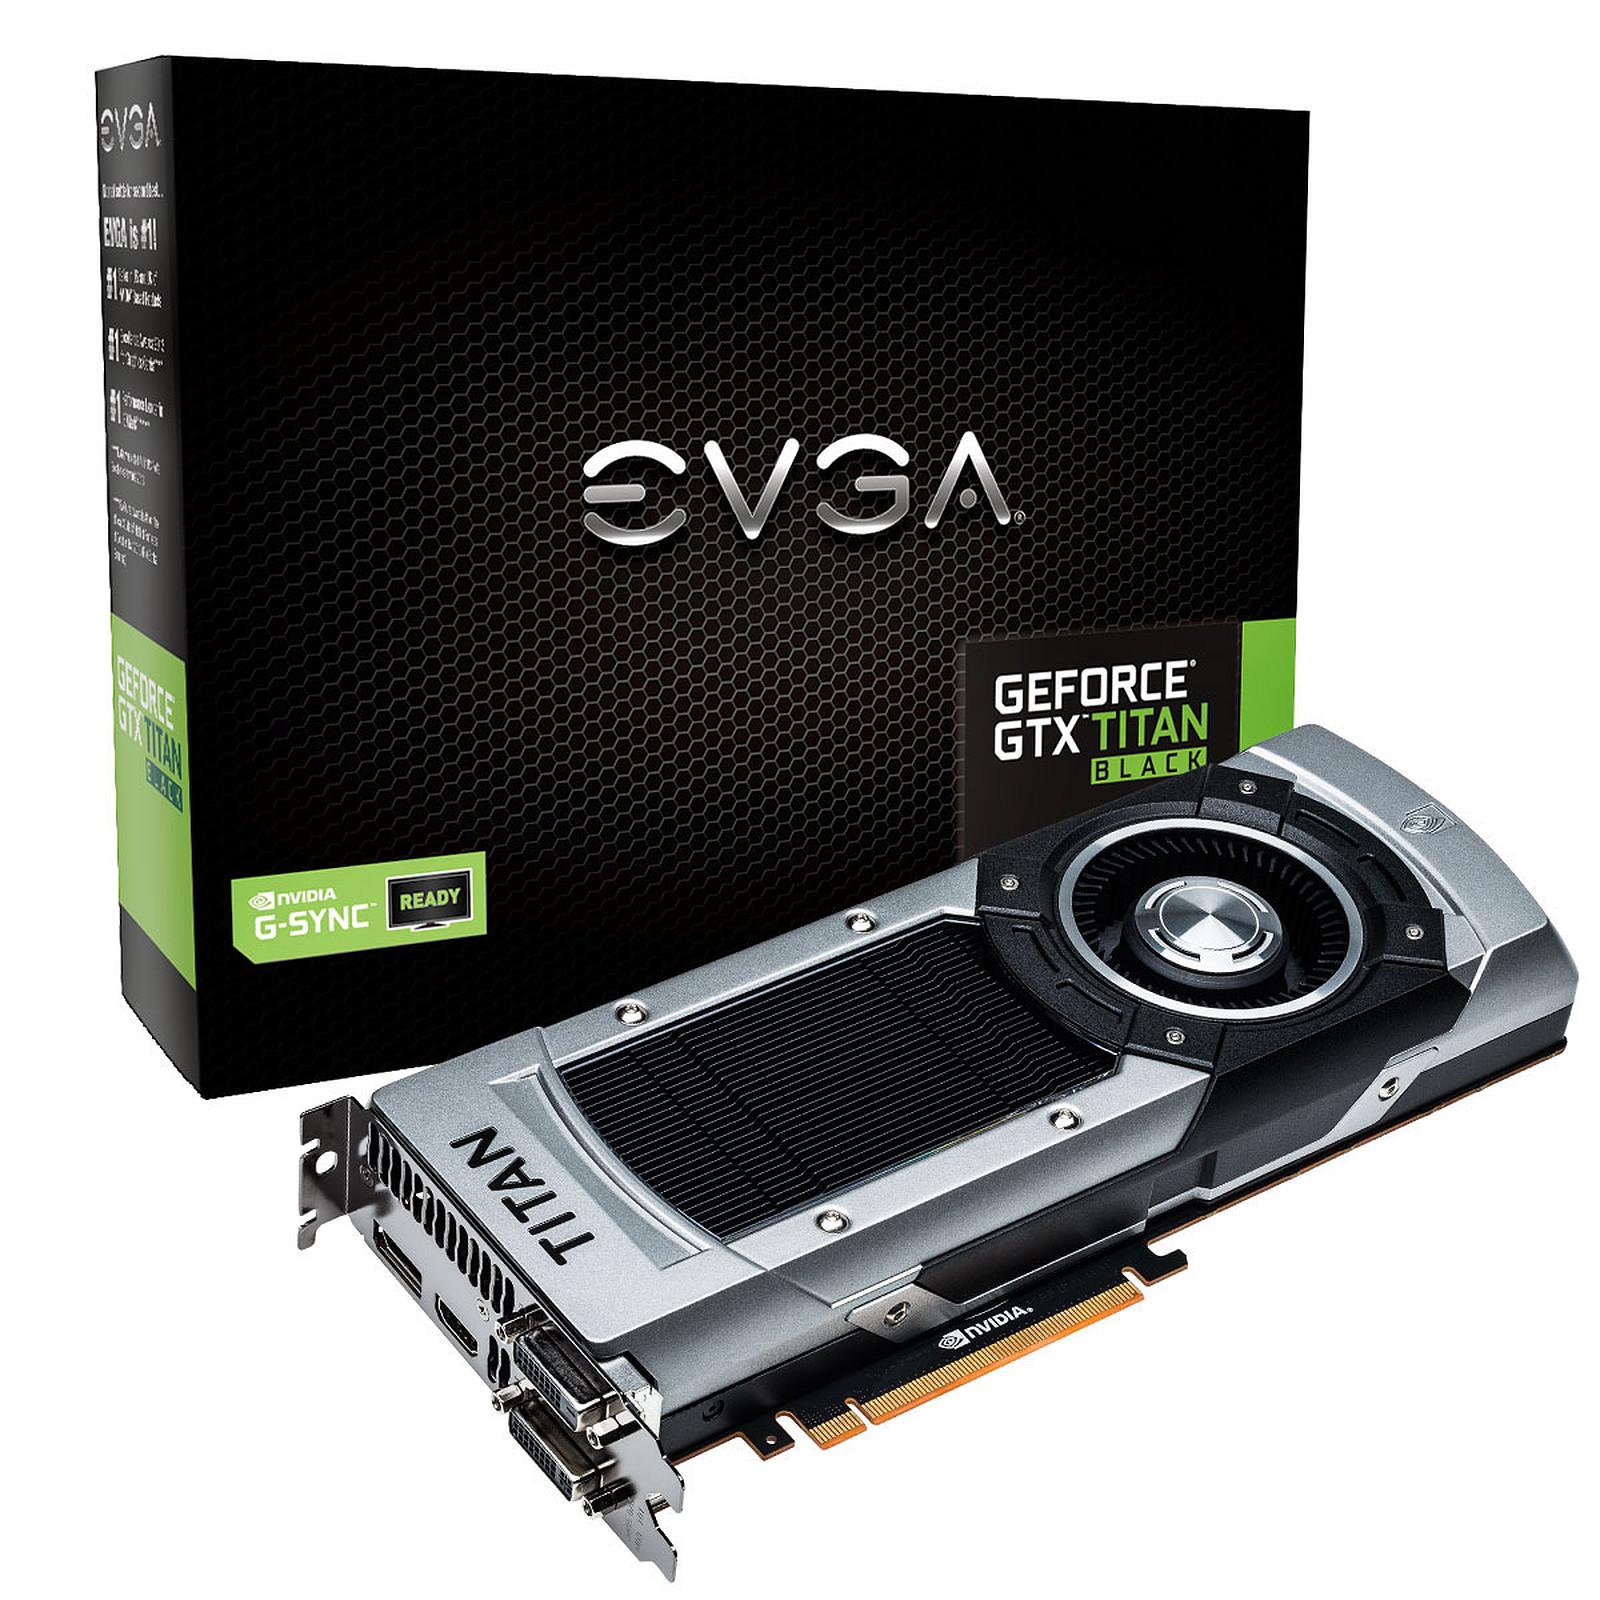 EVGA GeForce GTX TITAN Black 6 Go